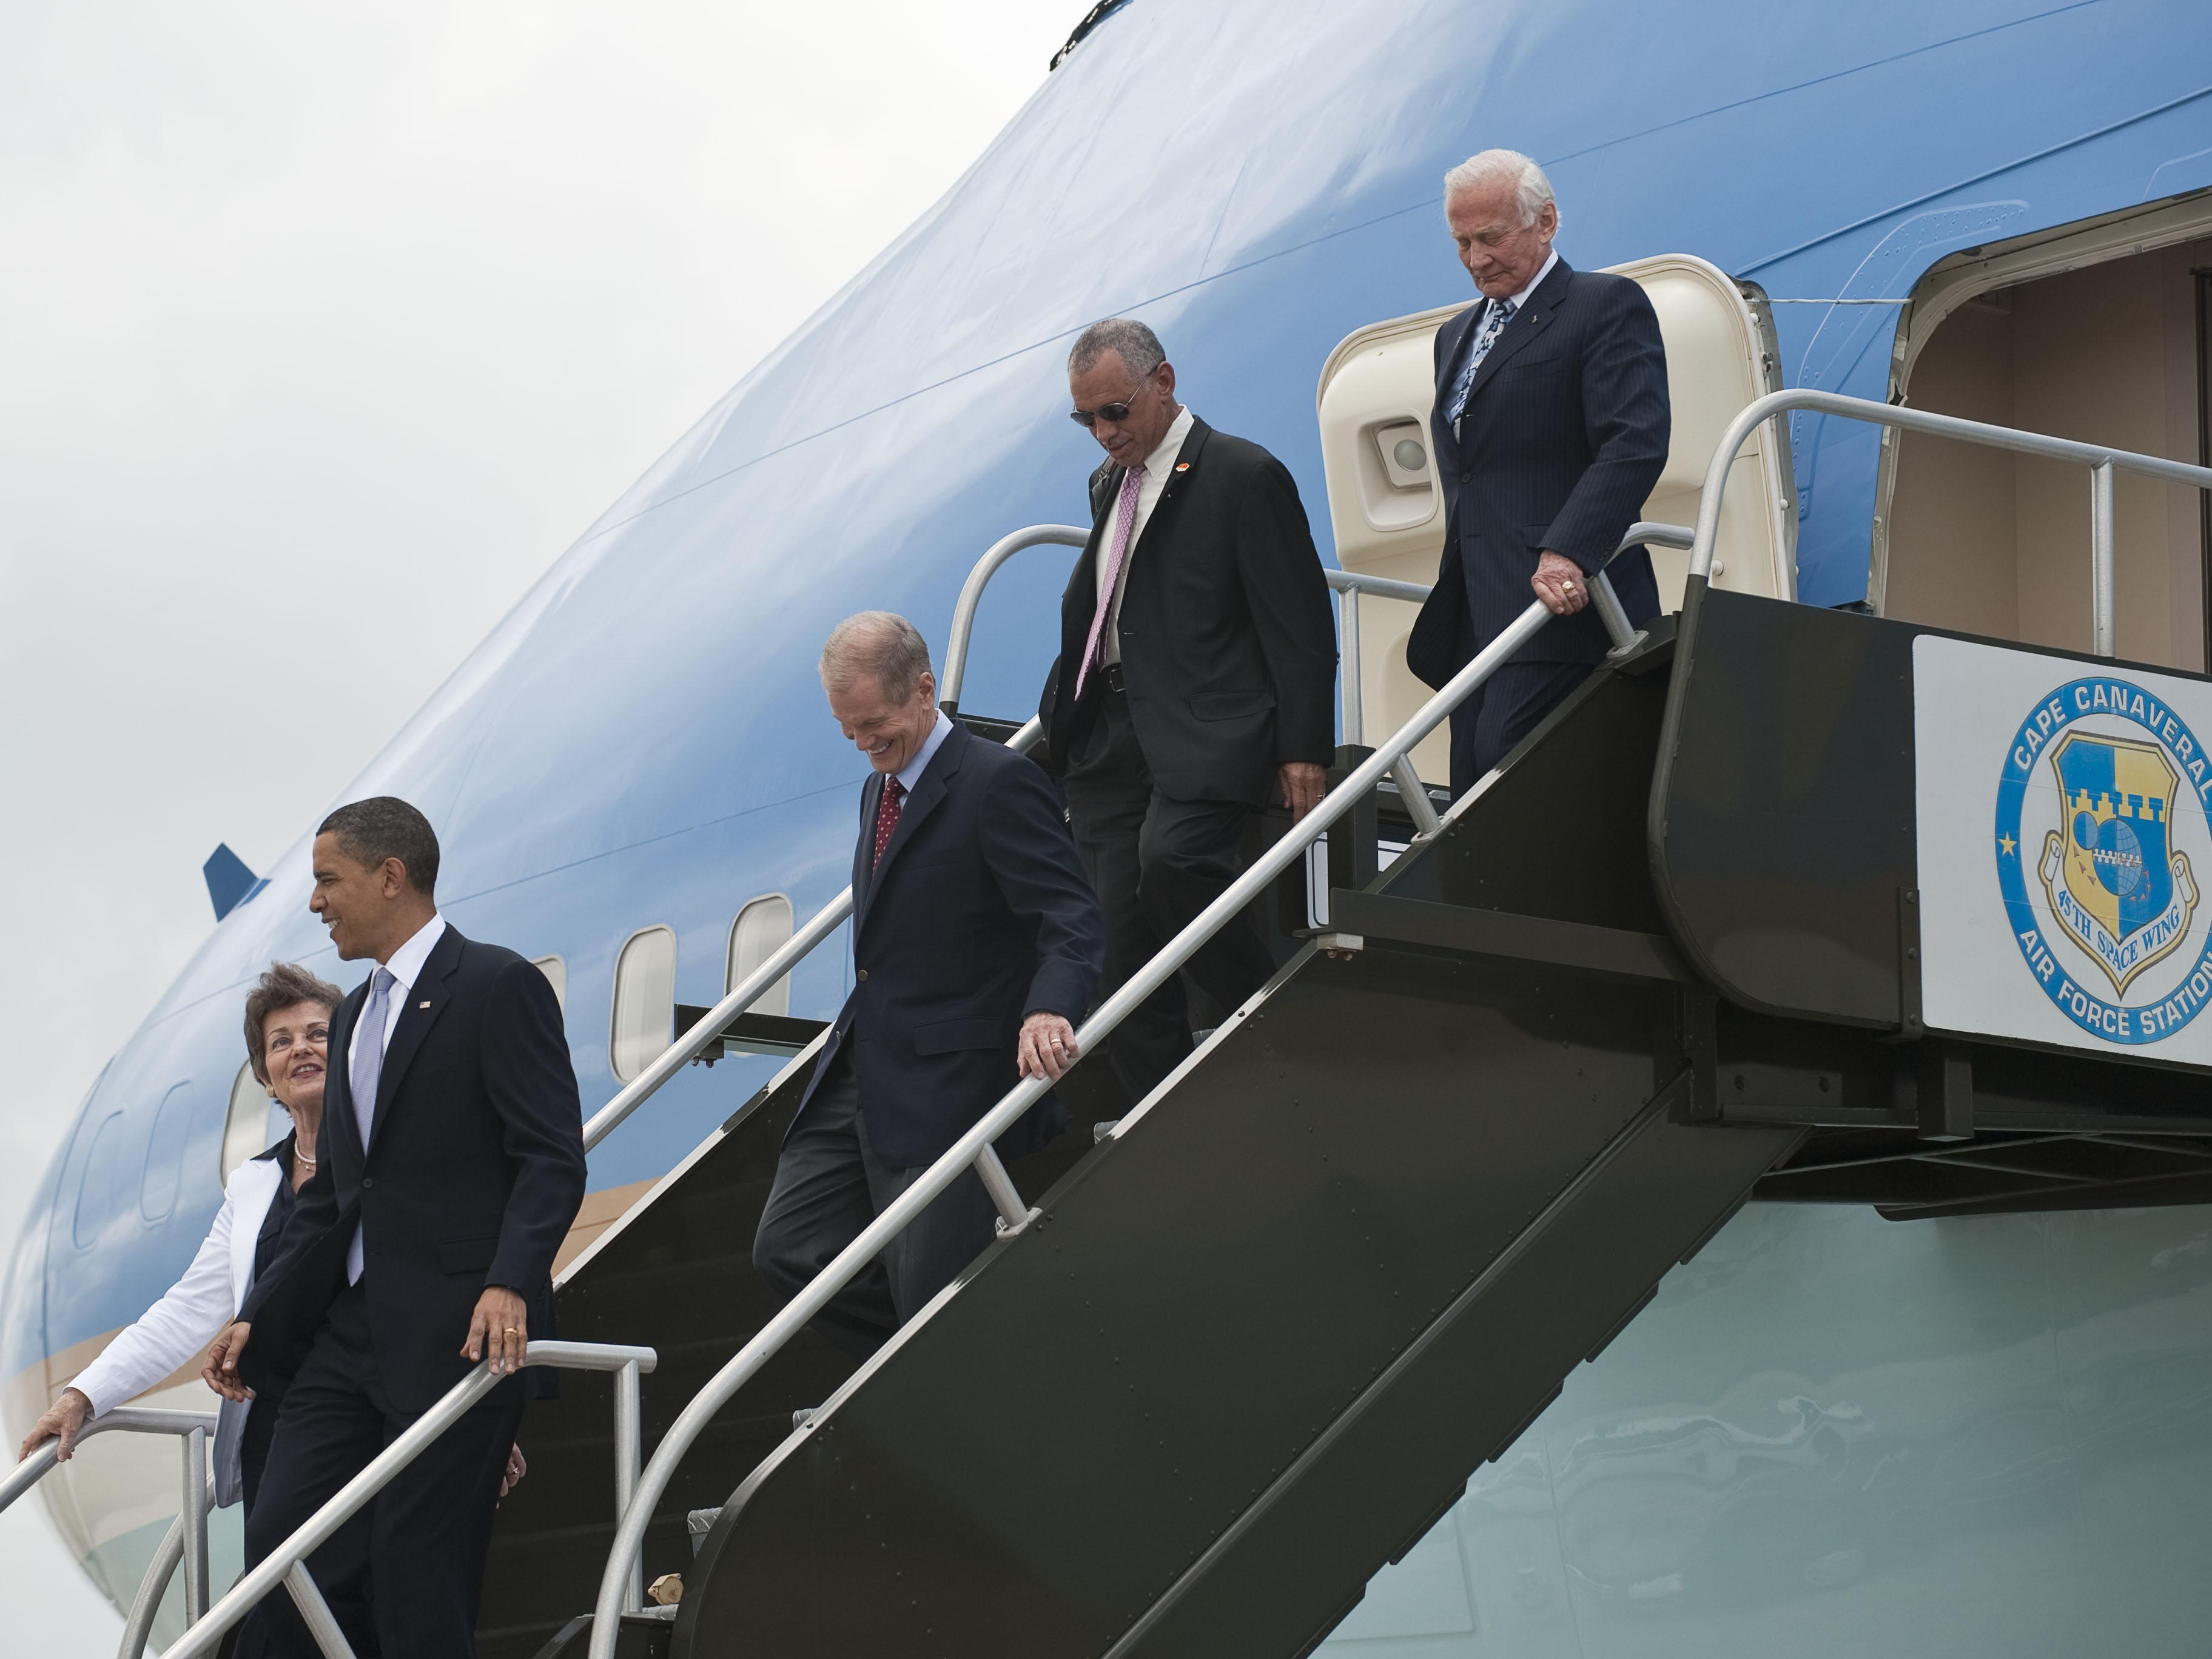 obama new nasa space shuttle - photo #44